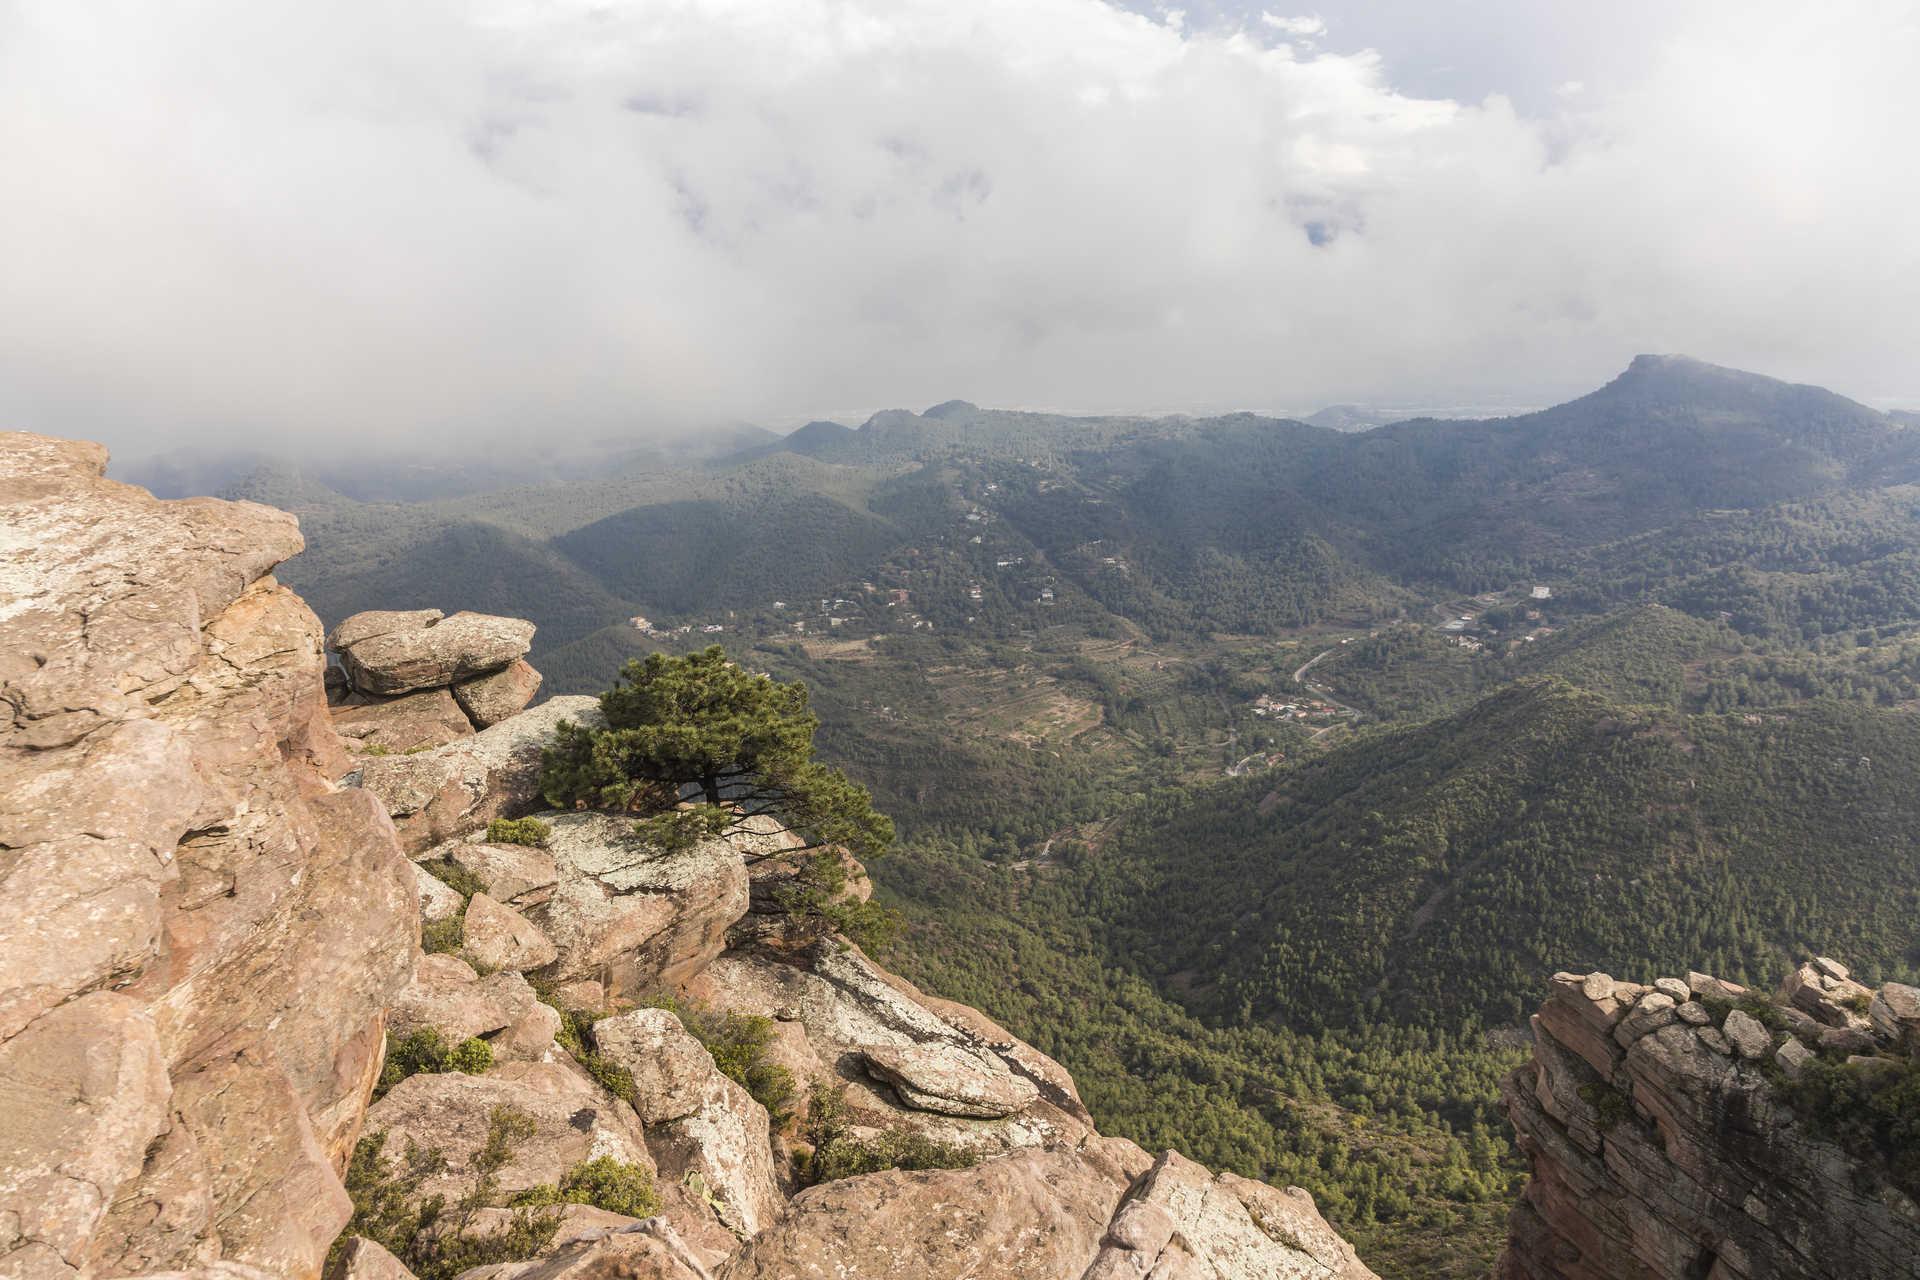 Parque Natural de la Sierra Calderona